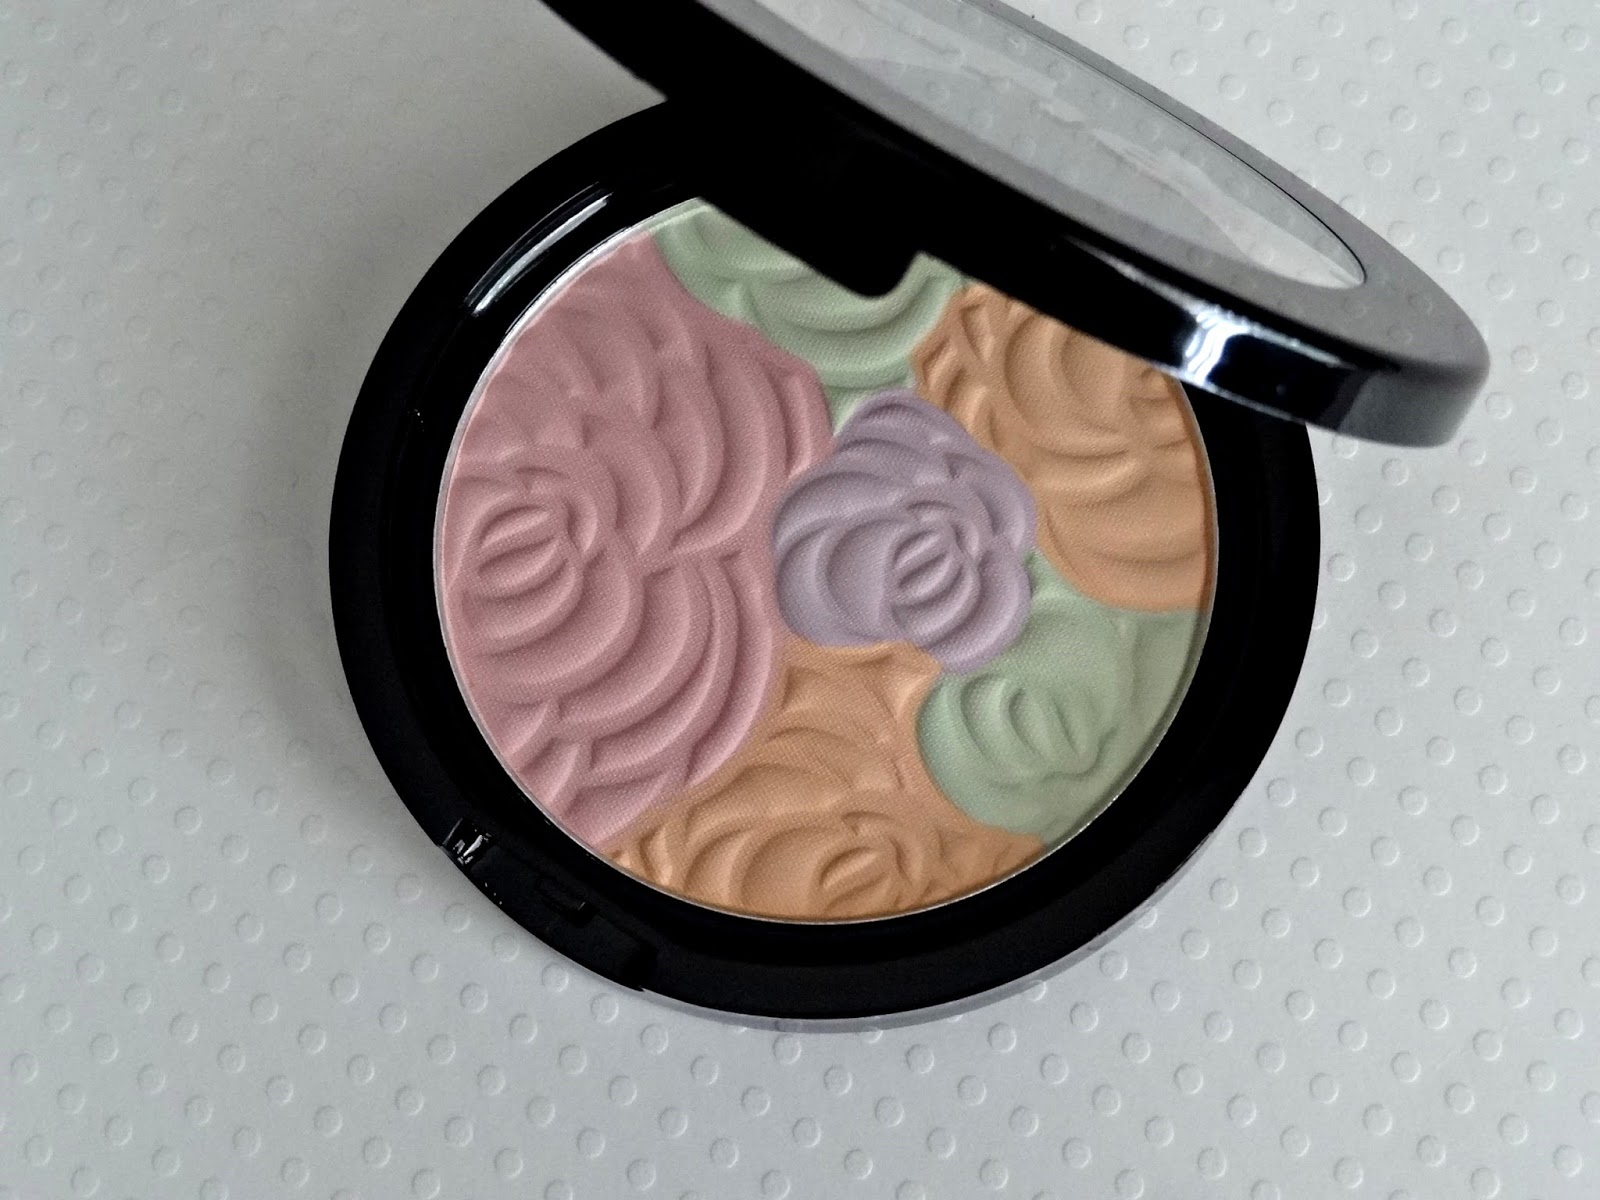 Makeup beauty and more jane cosmetics multi colored color correcting - Jane Cosmetics Multi Colored Color Correcting Powder 12 Ulta Com Is A Sheer Color Correcting Pressed Powder That Helps Even Skintone And Set Makeup